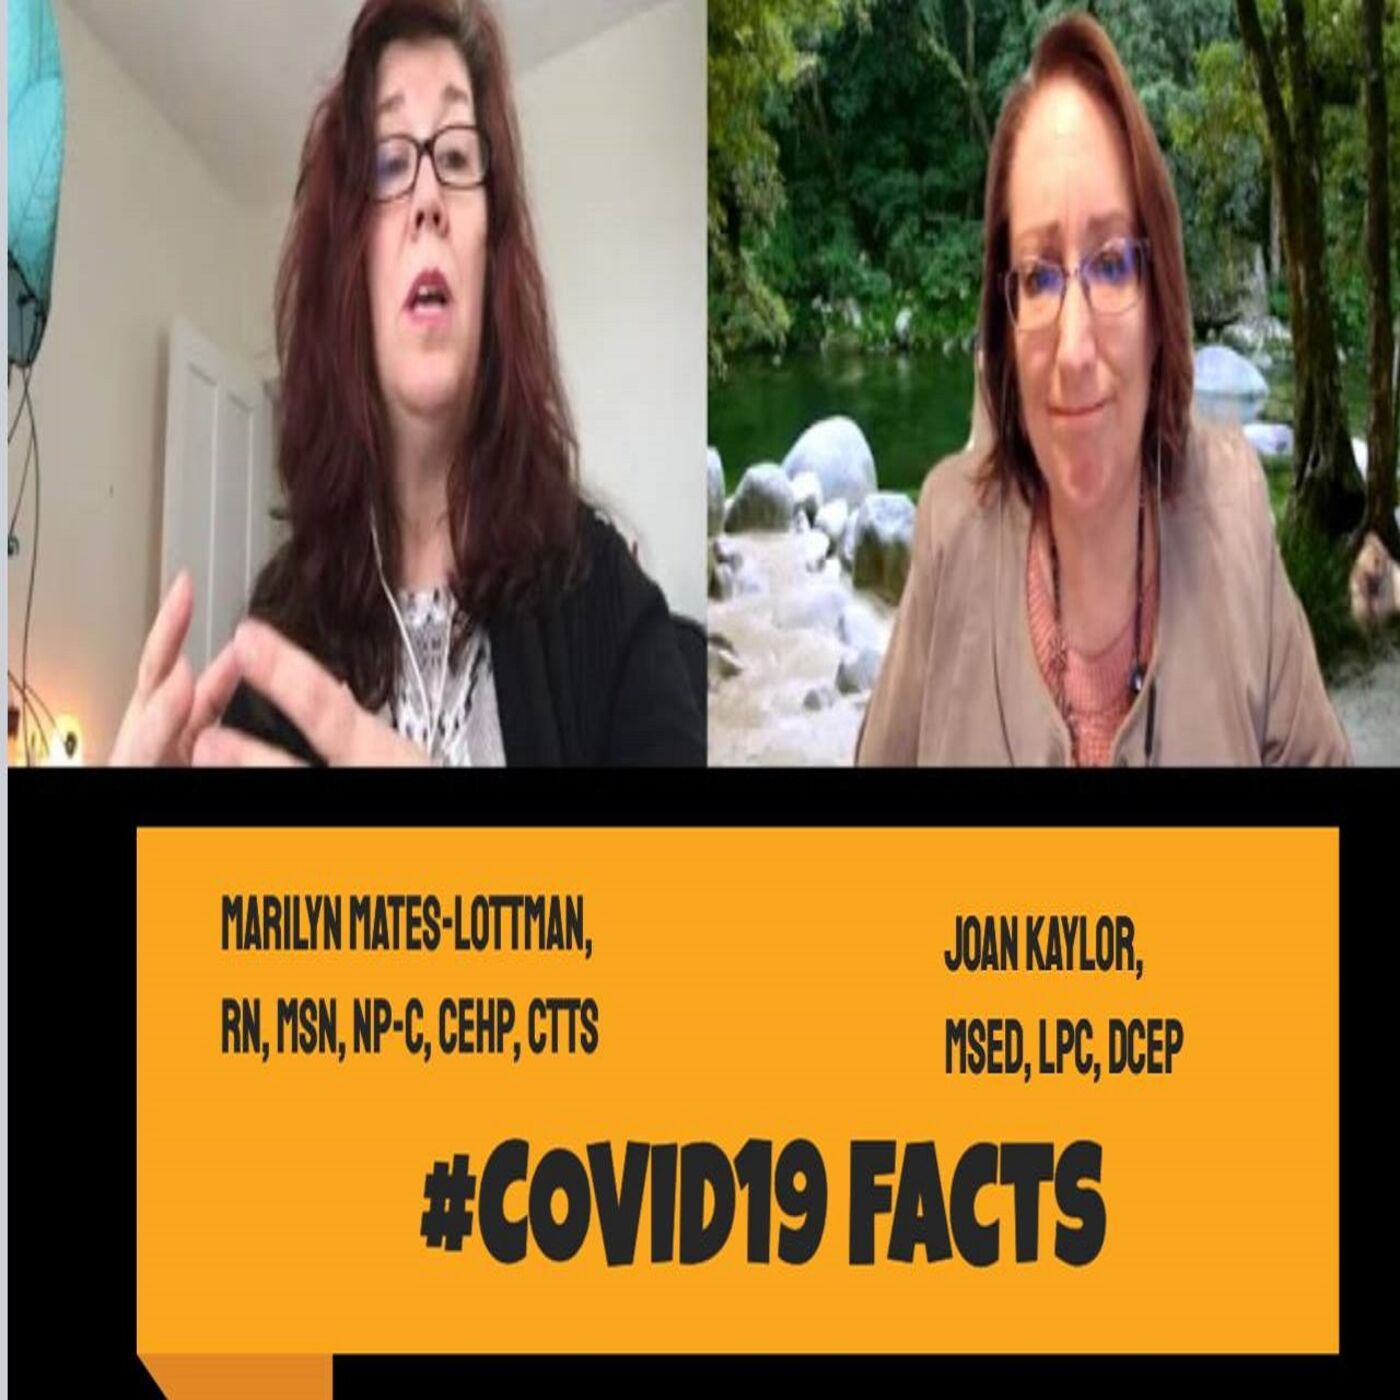 Facts on #COVID19 #coronavirus from Marilyn S. Mates-Lottman, RN, MSN, NP-C, CEHP, CTTS